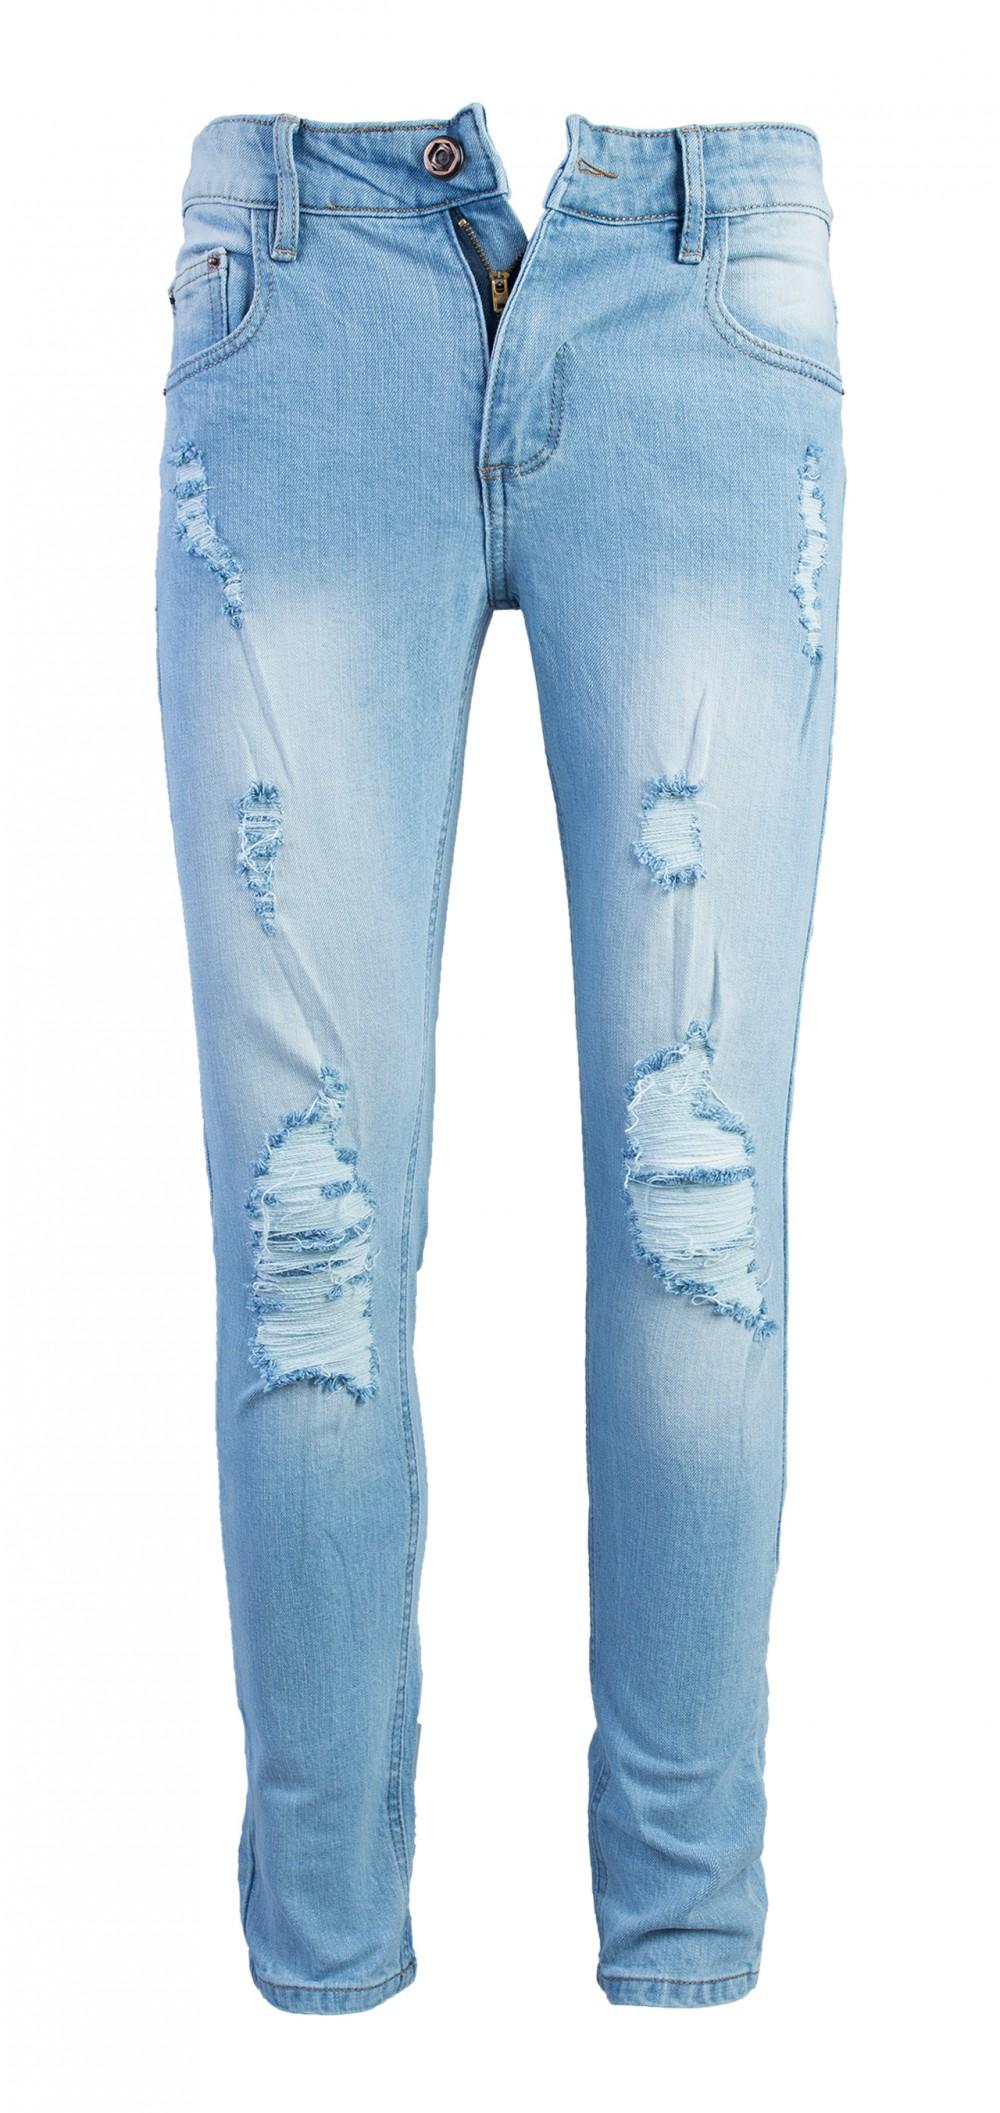 Quan Jeans Rach Xanh QJ1575